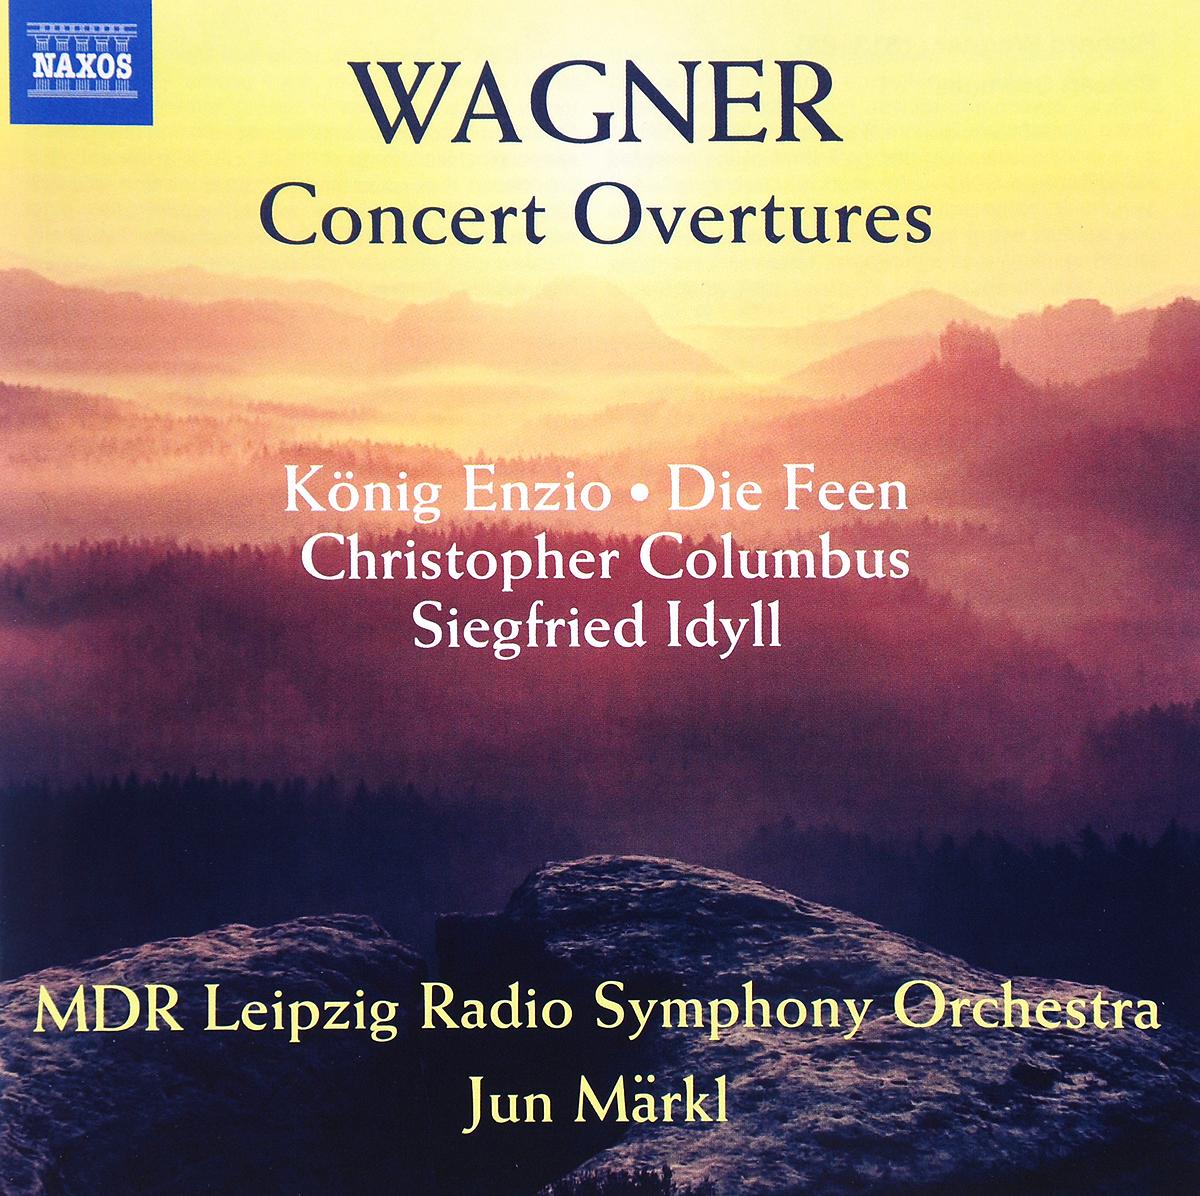 MDR Leipzig Radio Symphony Orchestra,Jun Markl MDR Leipzig Radio Symphony Orchestra, Jun Markl. Richard Wagner: Concert Overtures Nos. 1 & 2 купальник jun fly